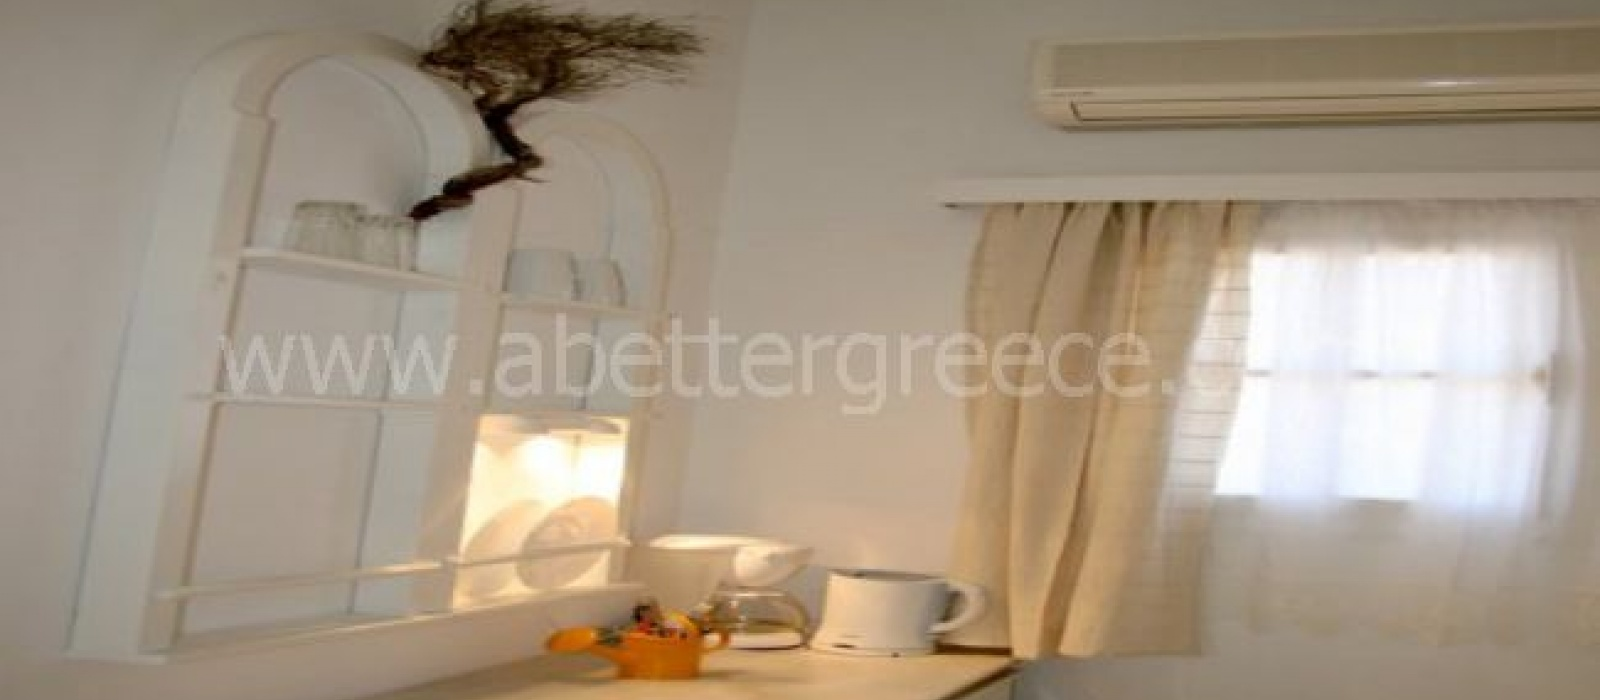 1 Bedrooms, Apartment, Vacation Rental, 1 Bathrooms, Listing ID 1172, Iraklia, Greece,